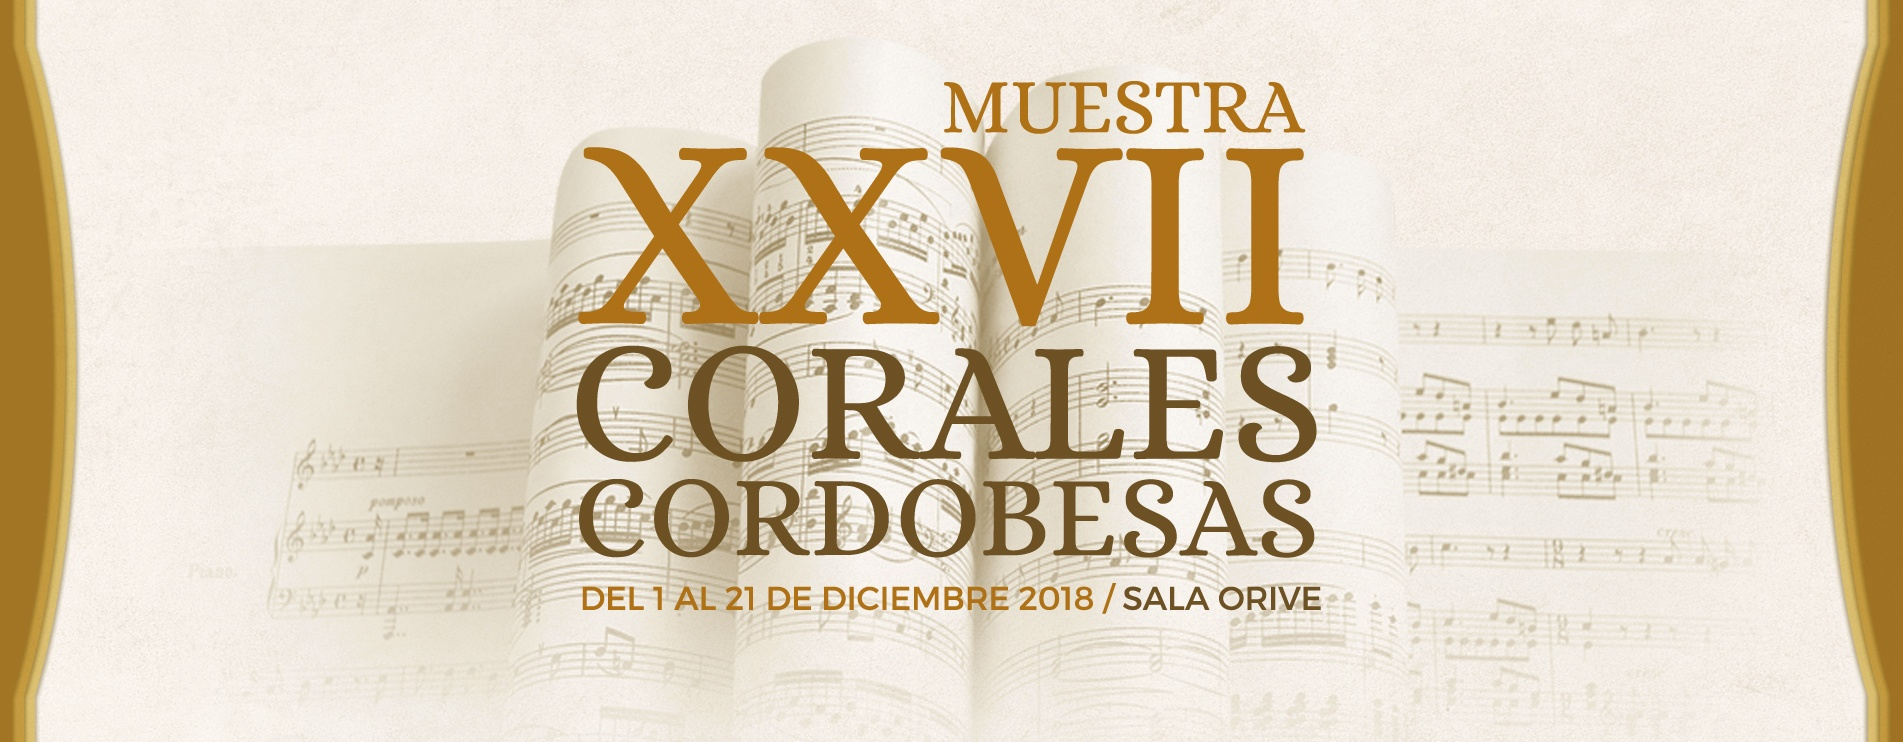 XXVII Muestra de Corales Cordobesas